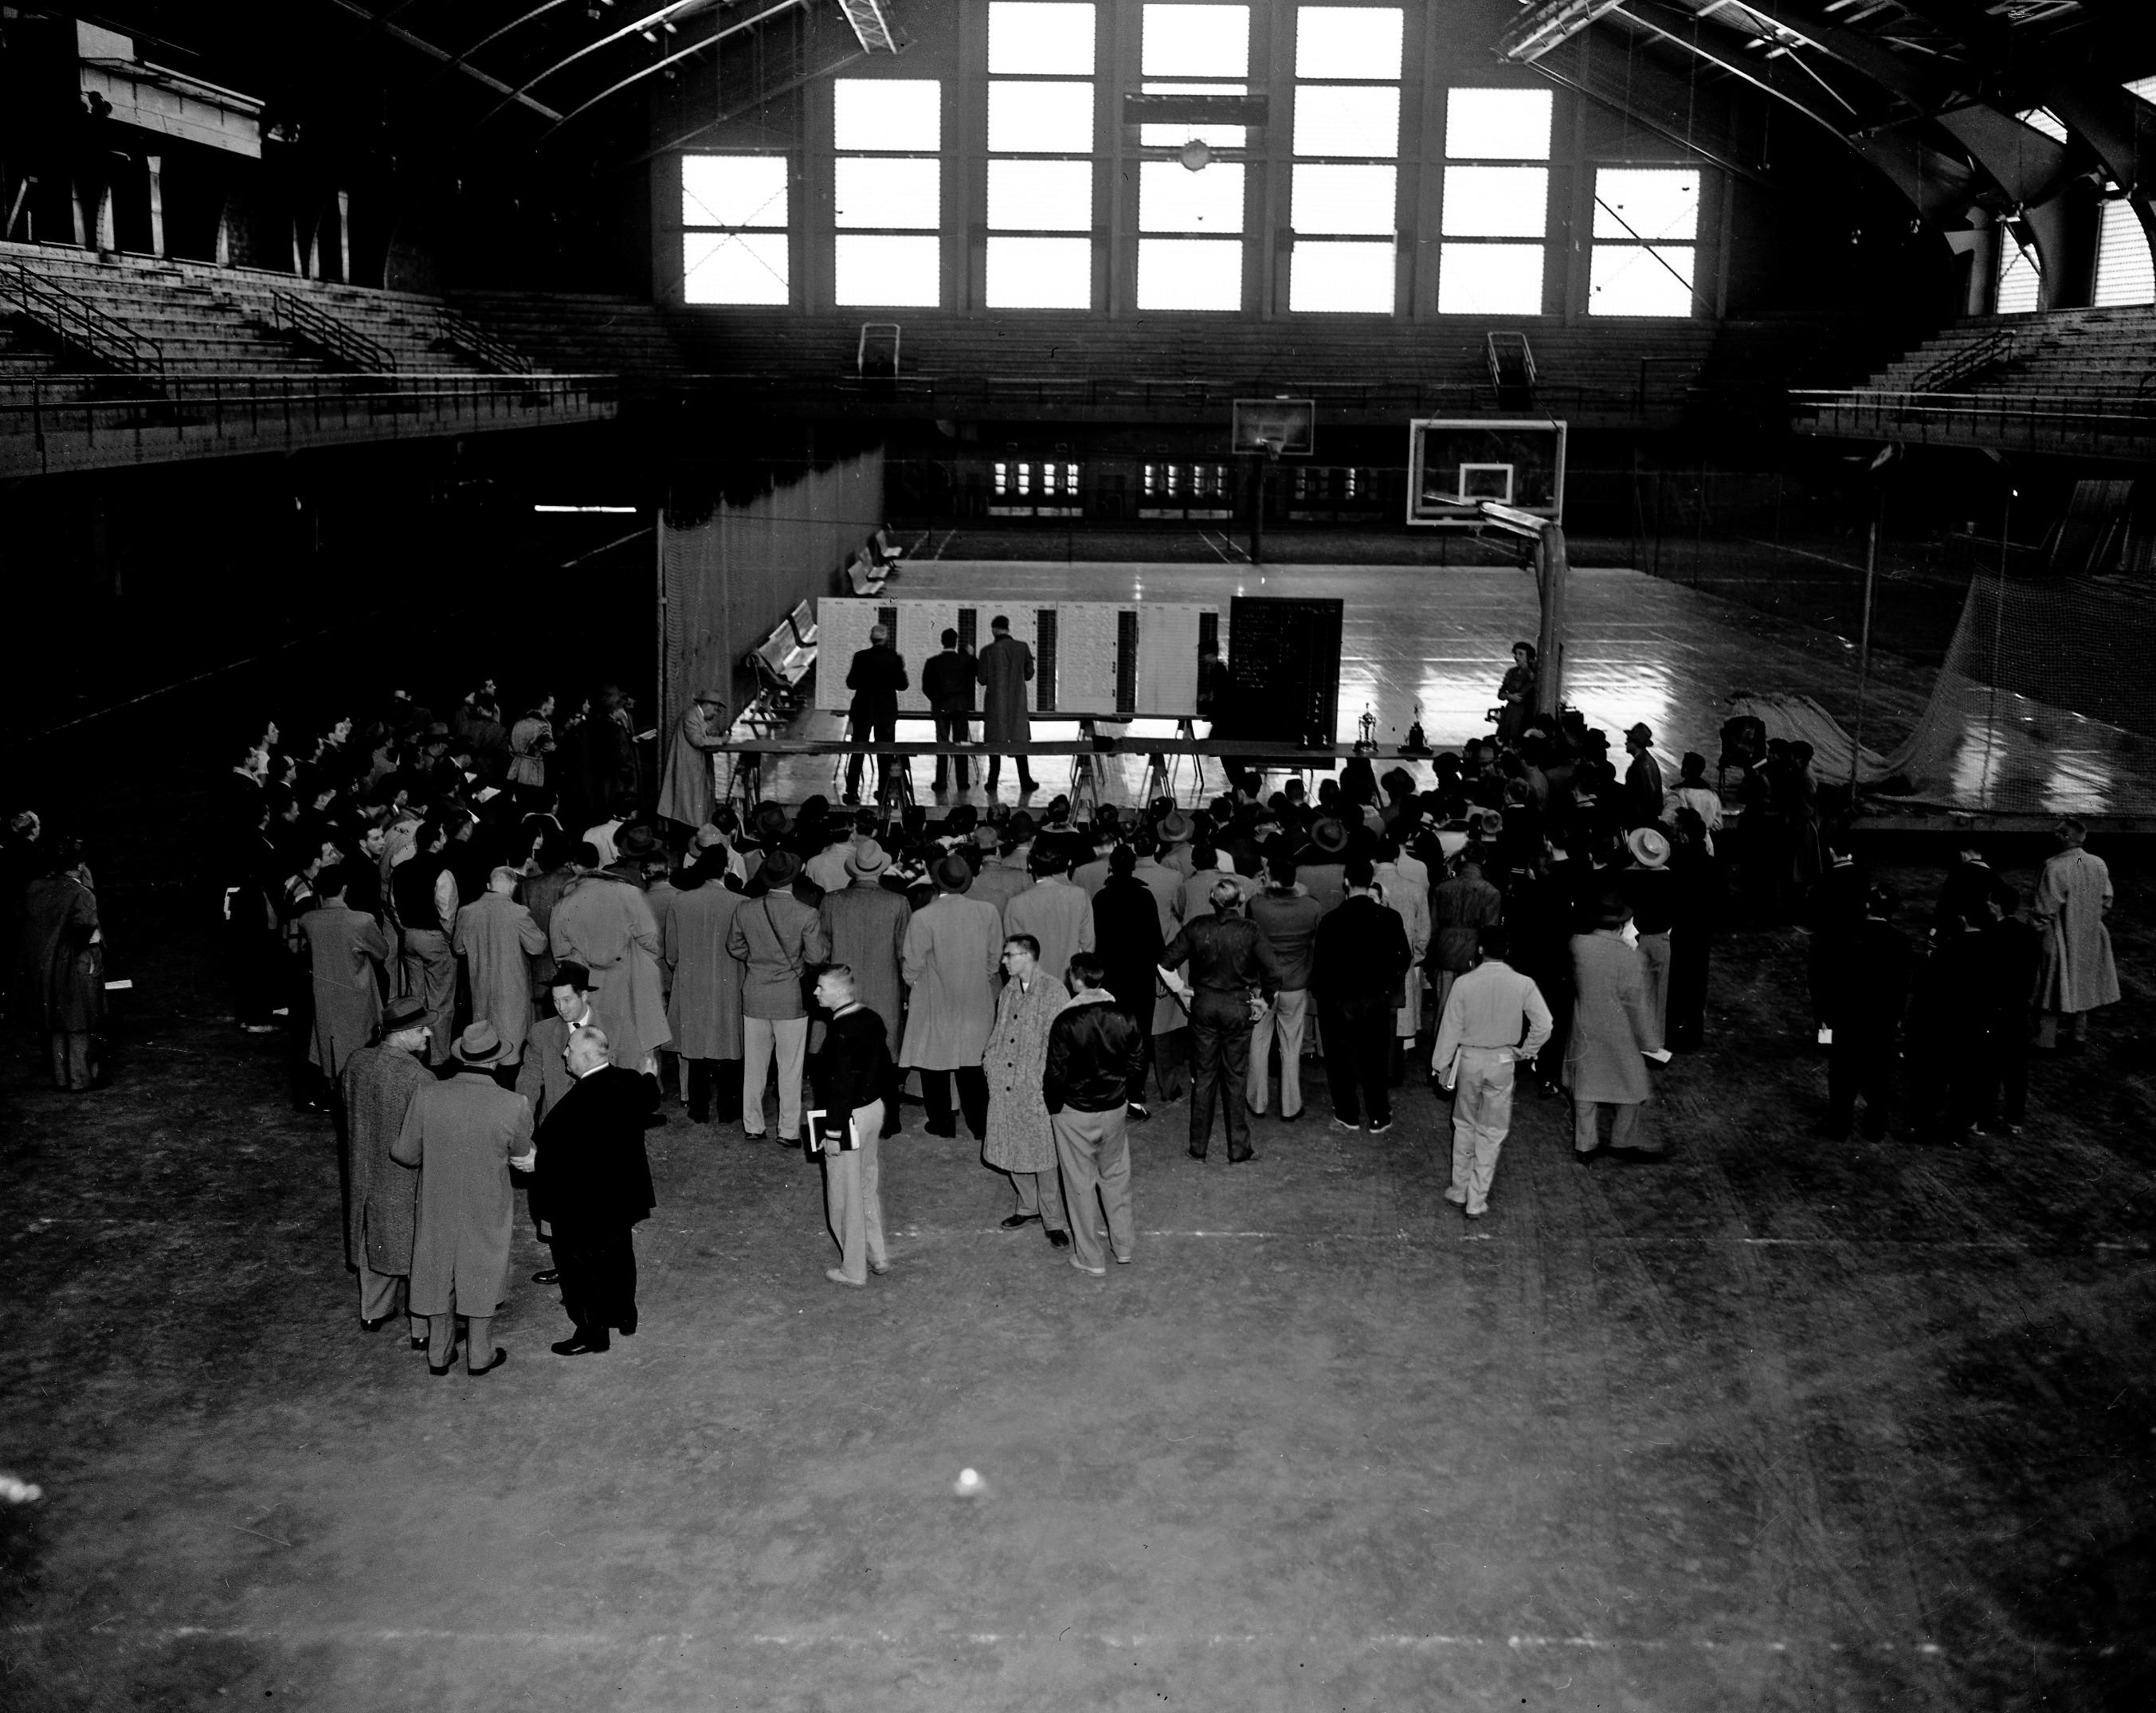 Cross Country NCAA Championship listings, 1952